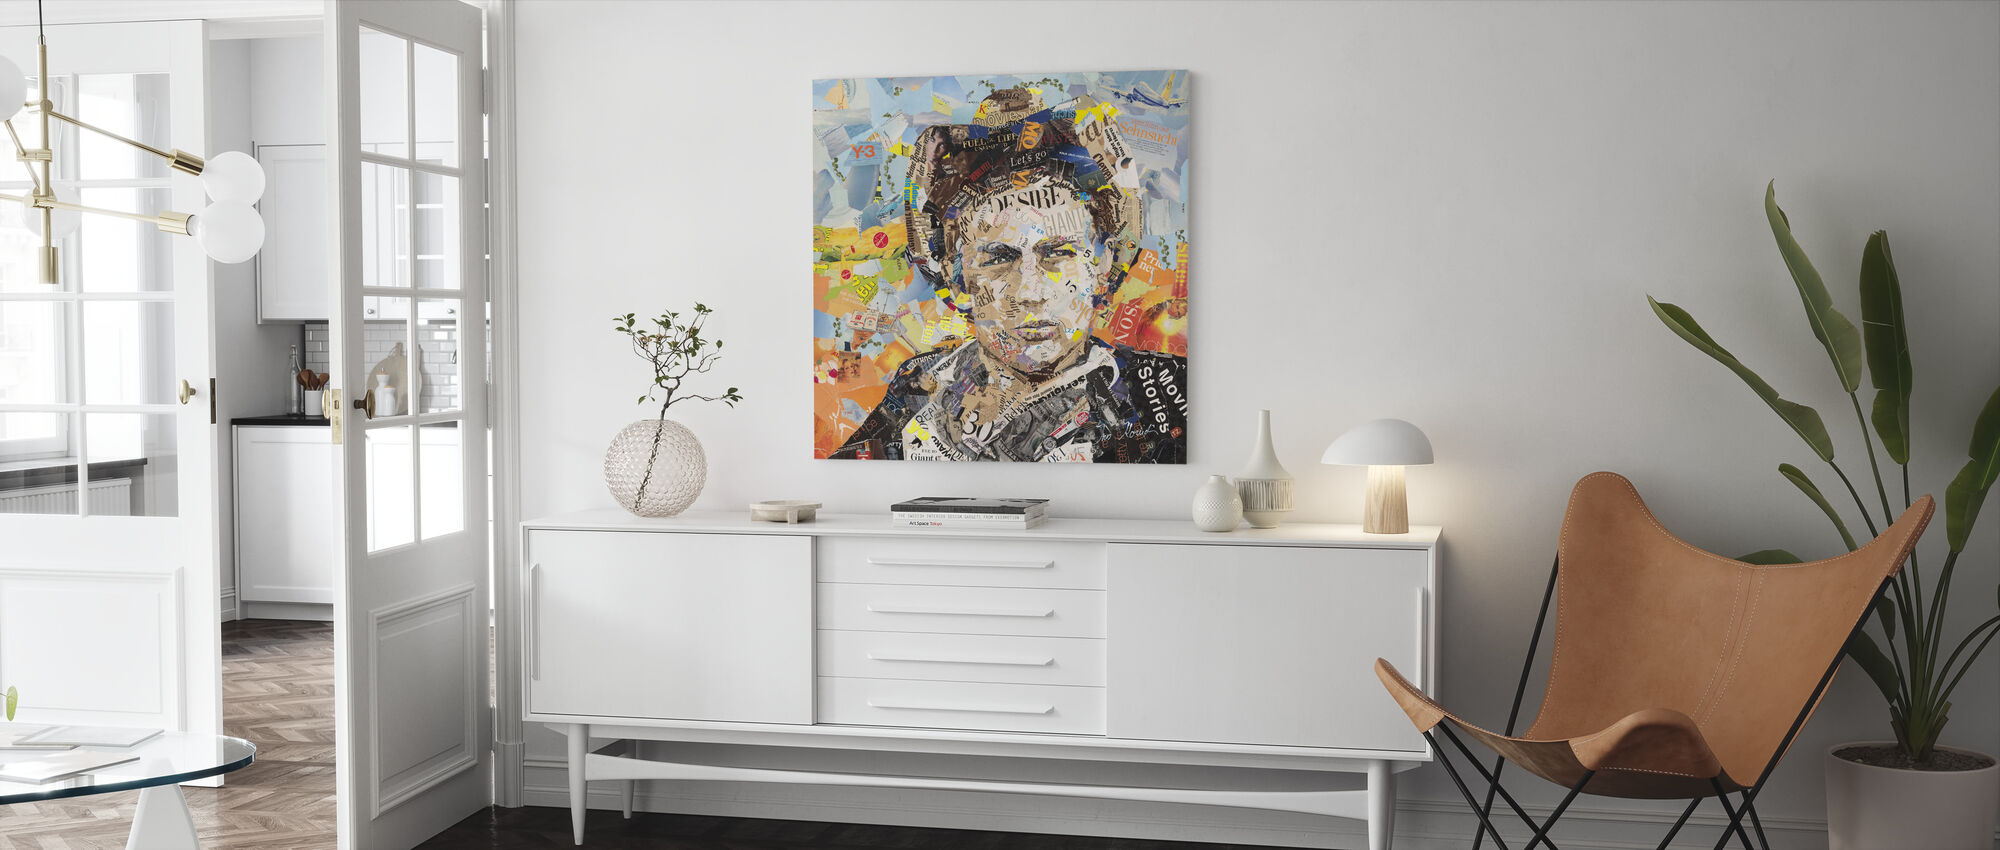 That Guy's Gotta Stop - Canvas print - Living Room